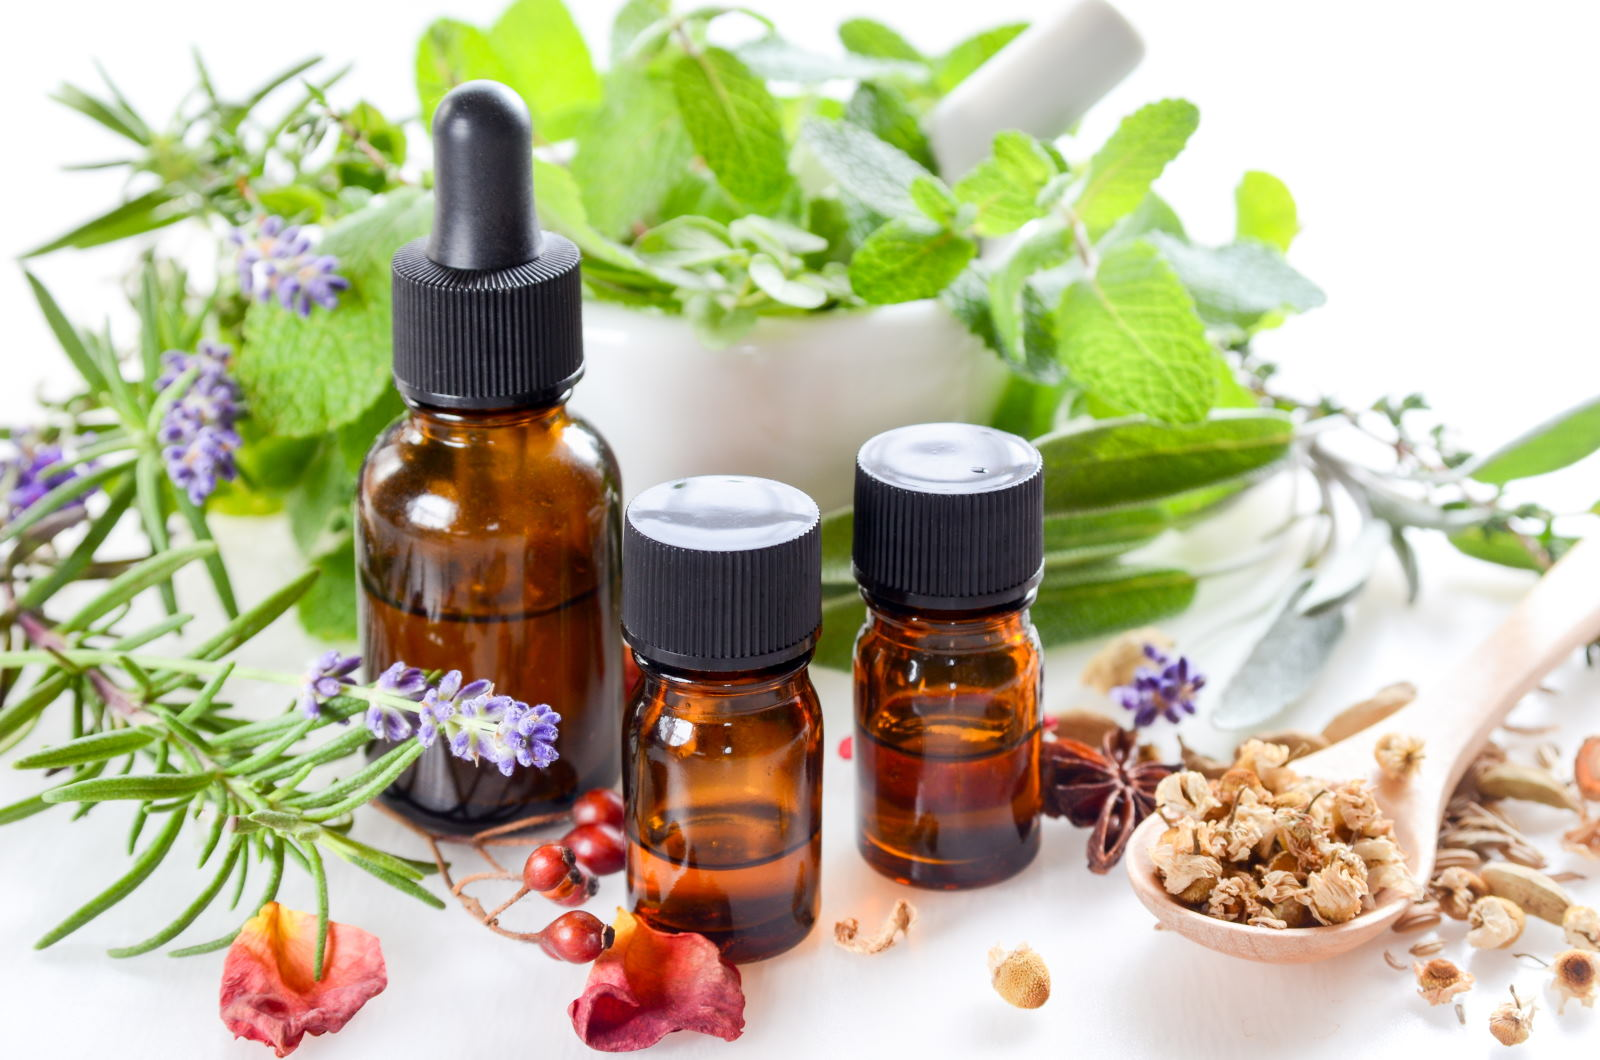 Ilustrasi Obat Herbal. [Foto/istock]